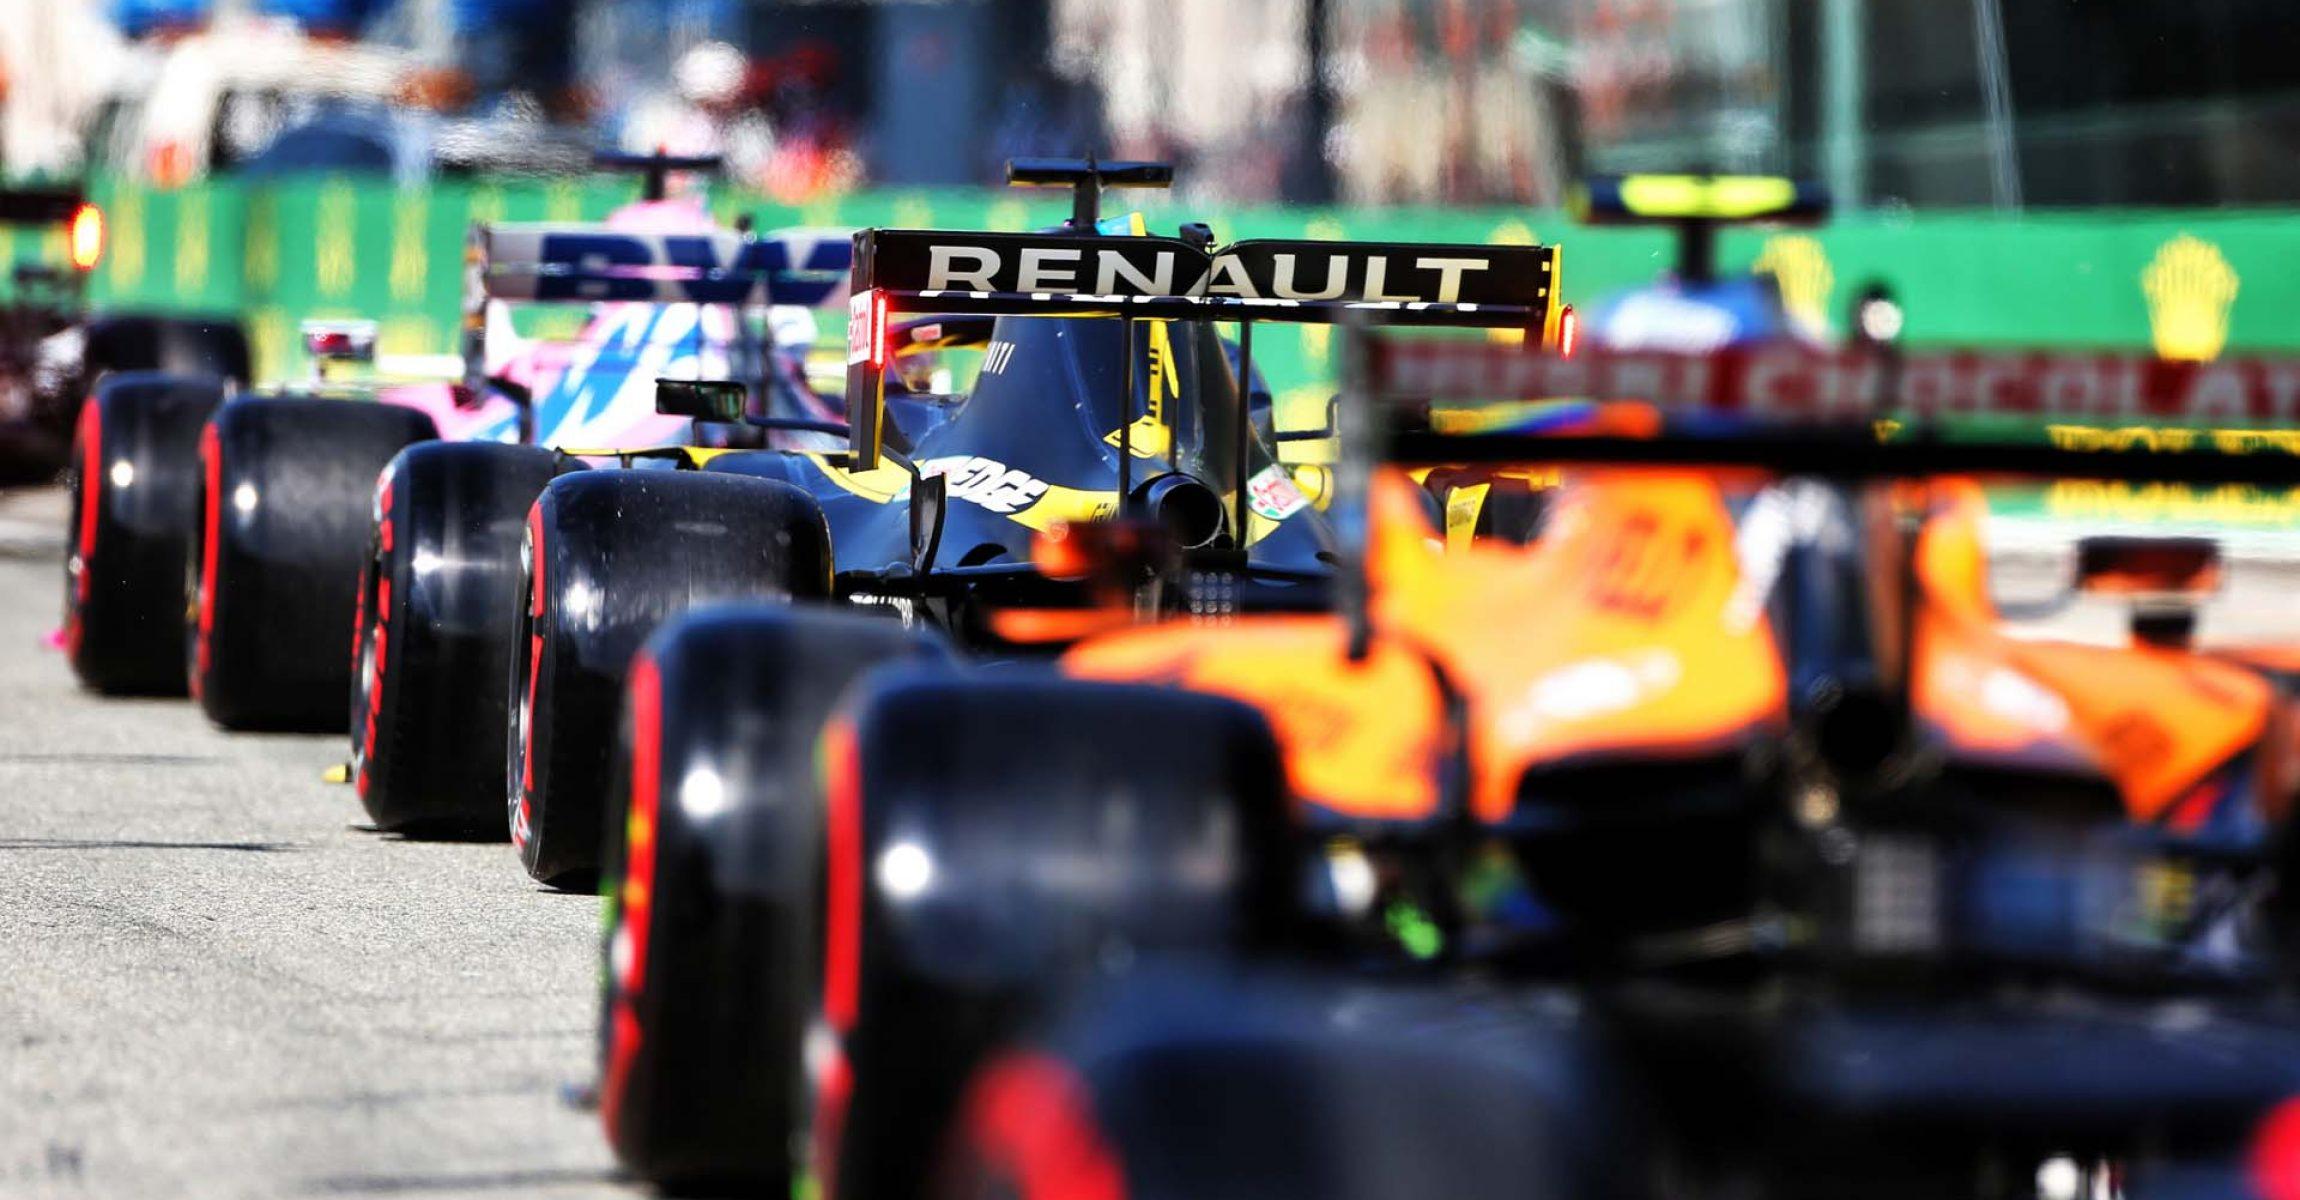 Daniel Ricciardo (AUS) Renault F1 Team RS20 leaves the pits. Italian Grand Prix, Saturday 5th September 2020. Monza Italy.